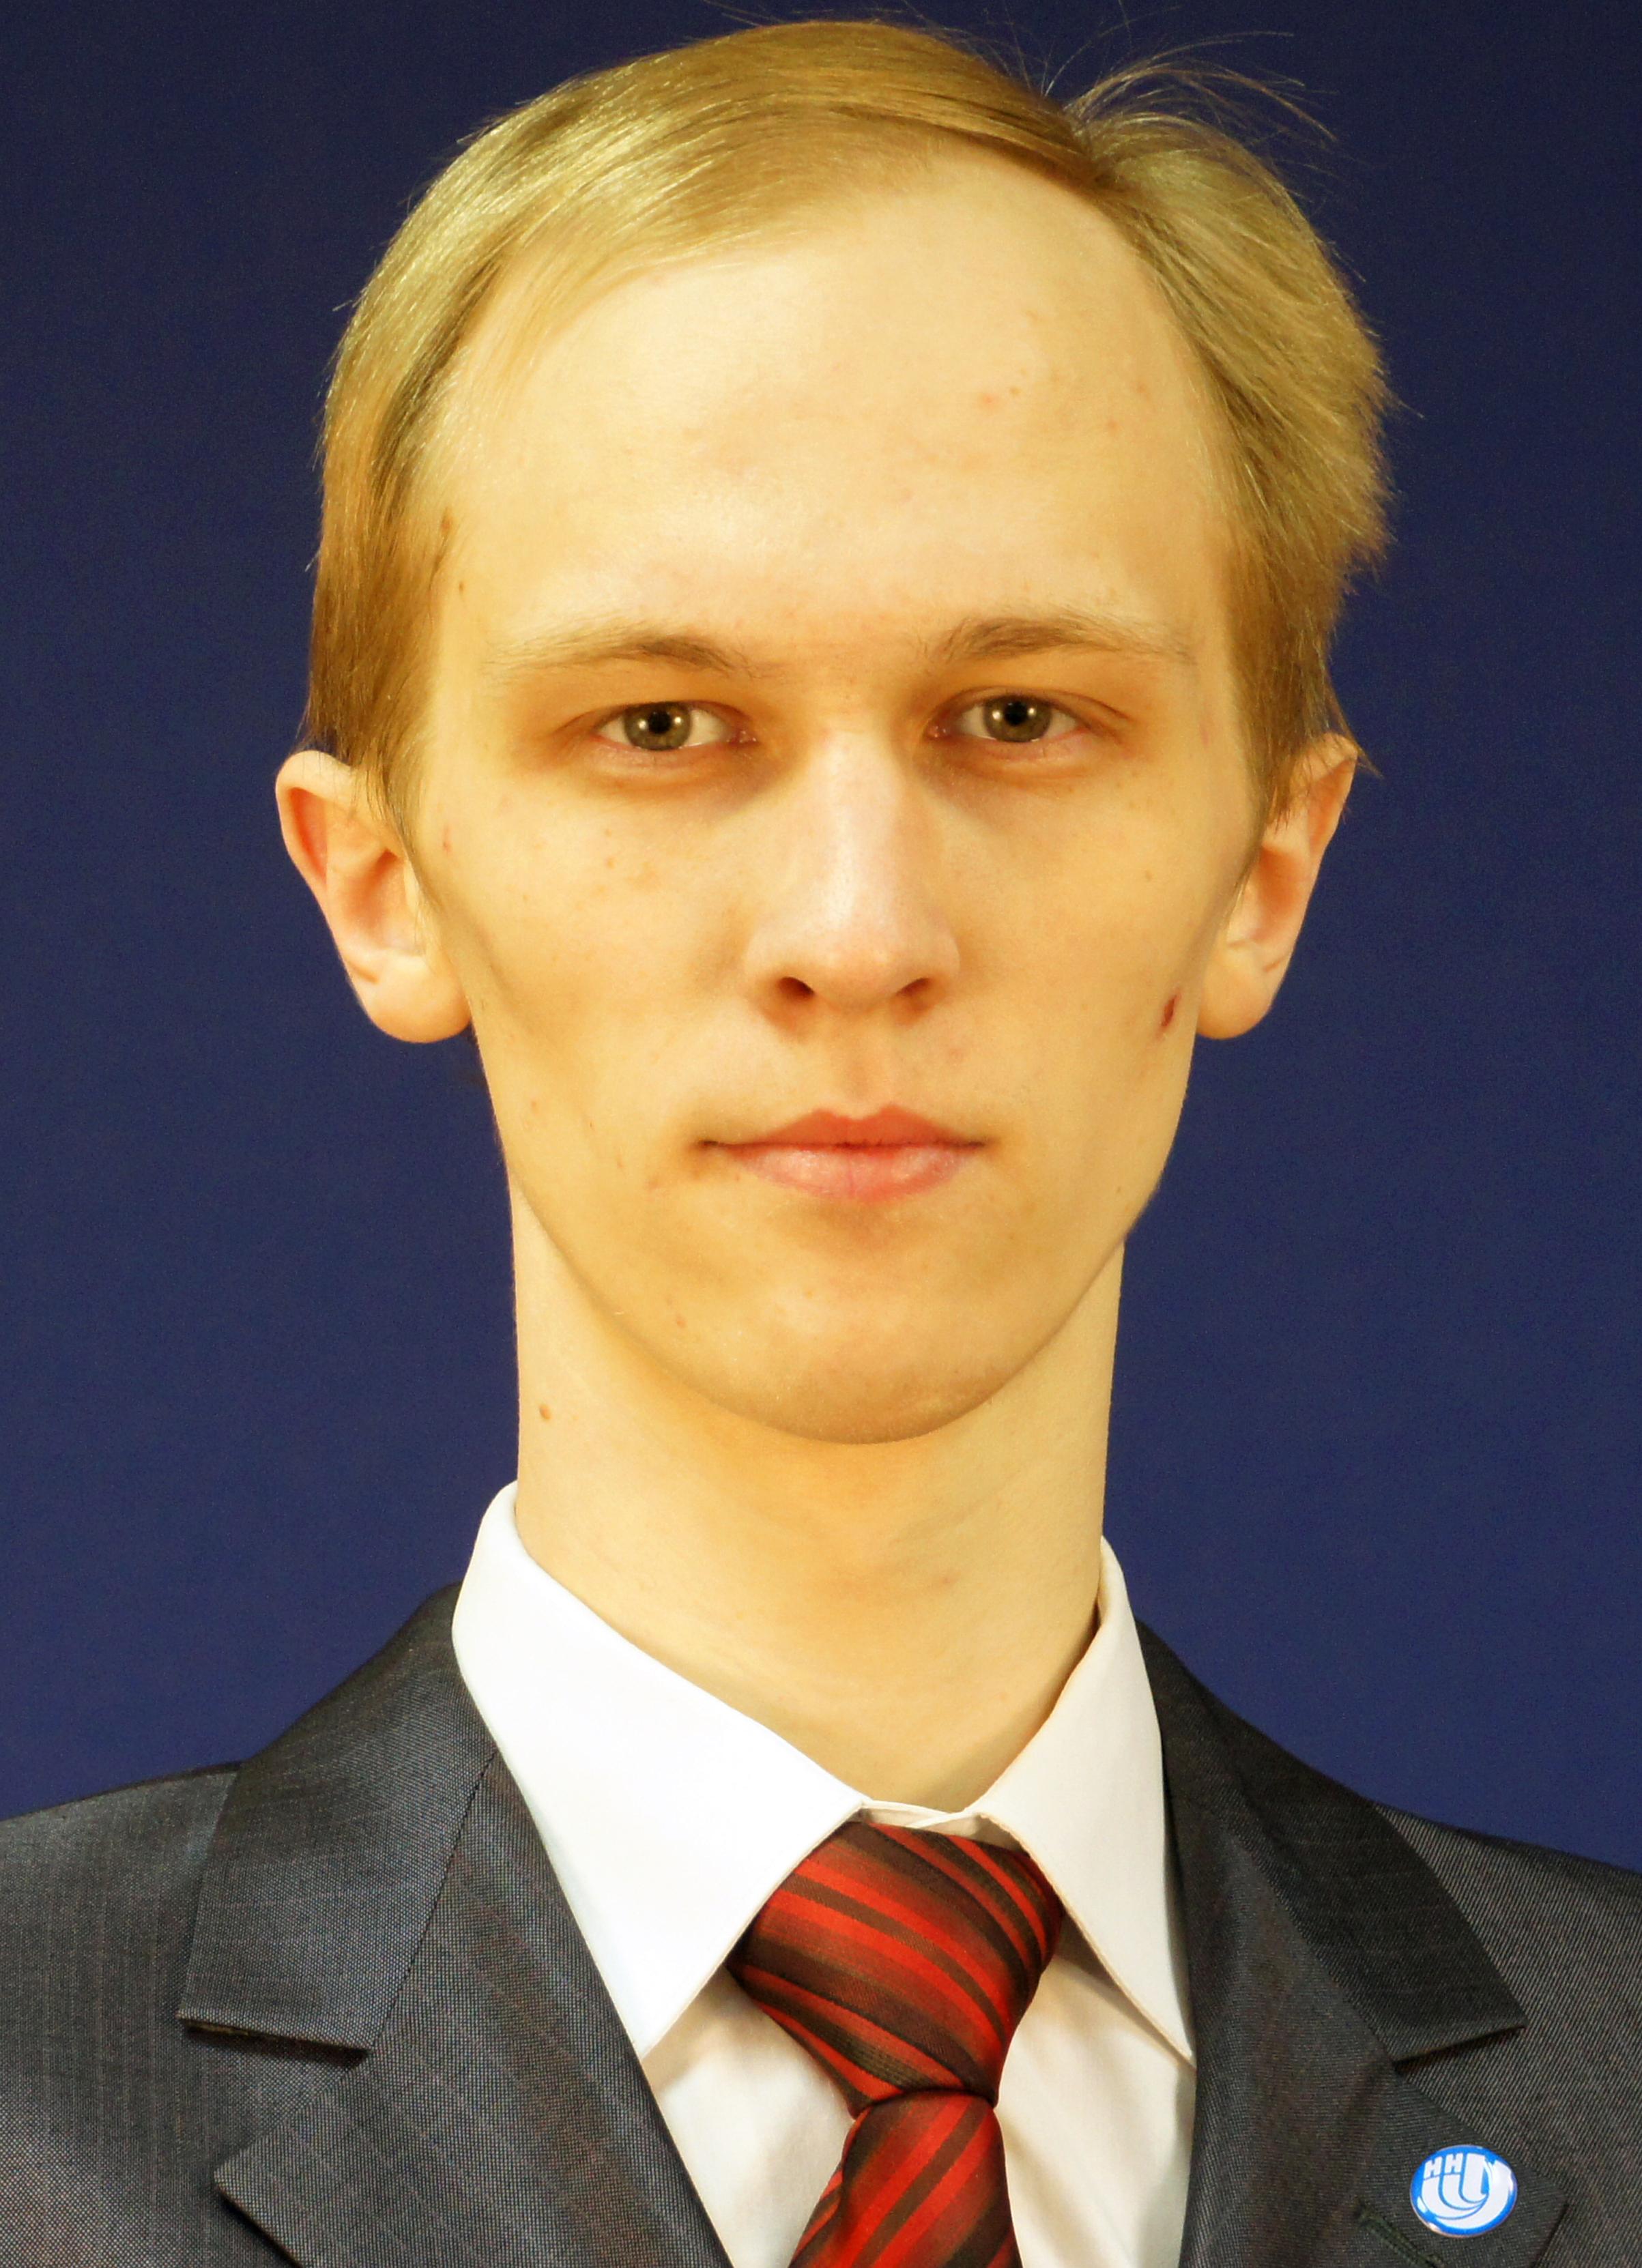 Мазуркевич Даниил Алексеевич